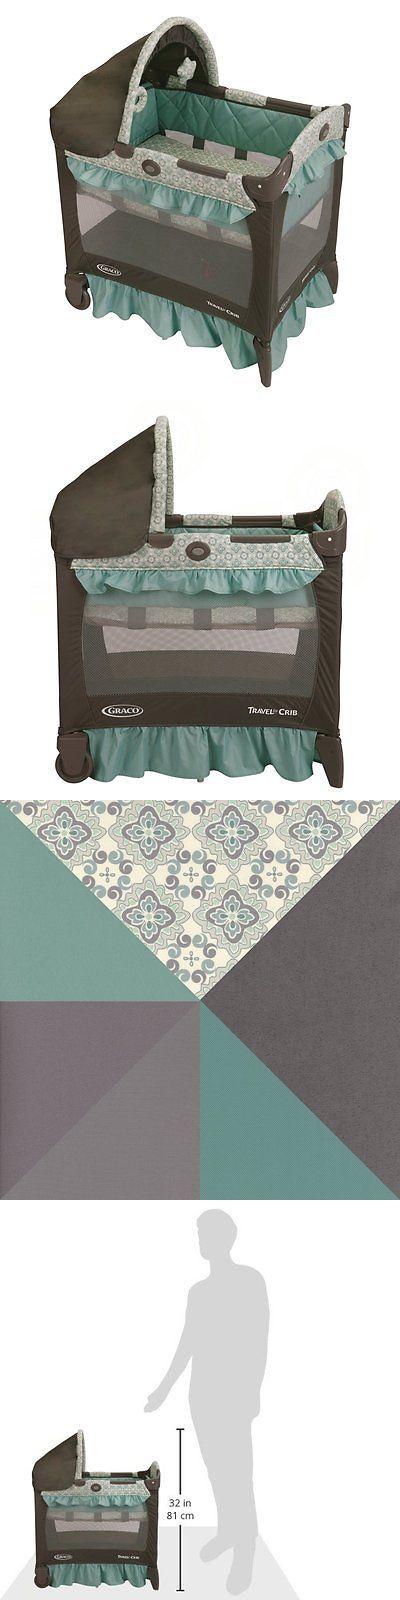 Baby Nursery: Travel Infant Baby Bassinet Bed Nursery Furniture Portable Comfort Newborn -Crib -> BUY IT NOW ONLY: $101.77 on eBay!